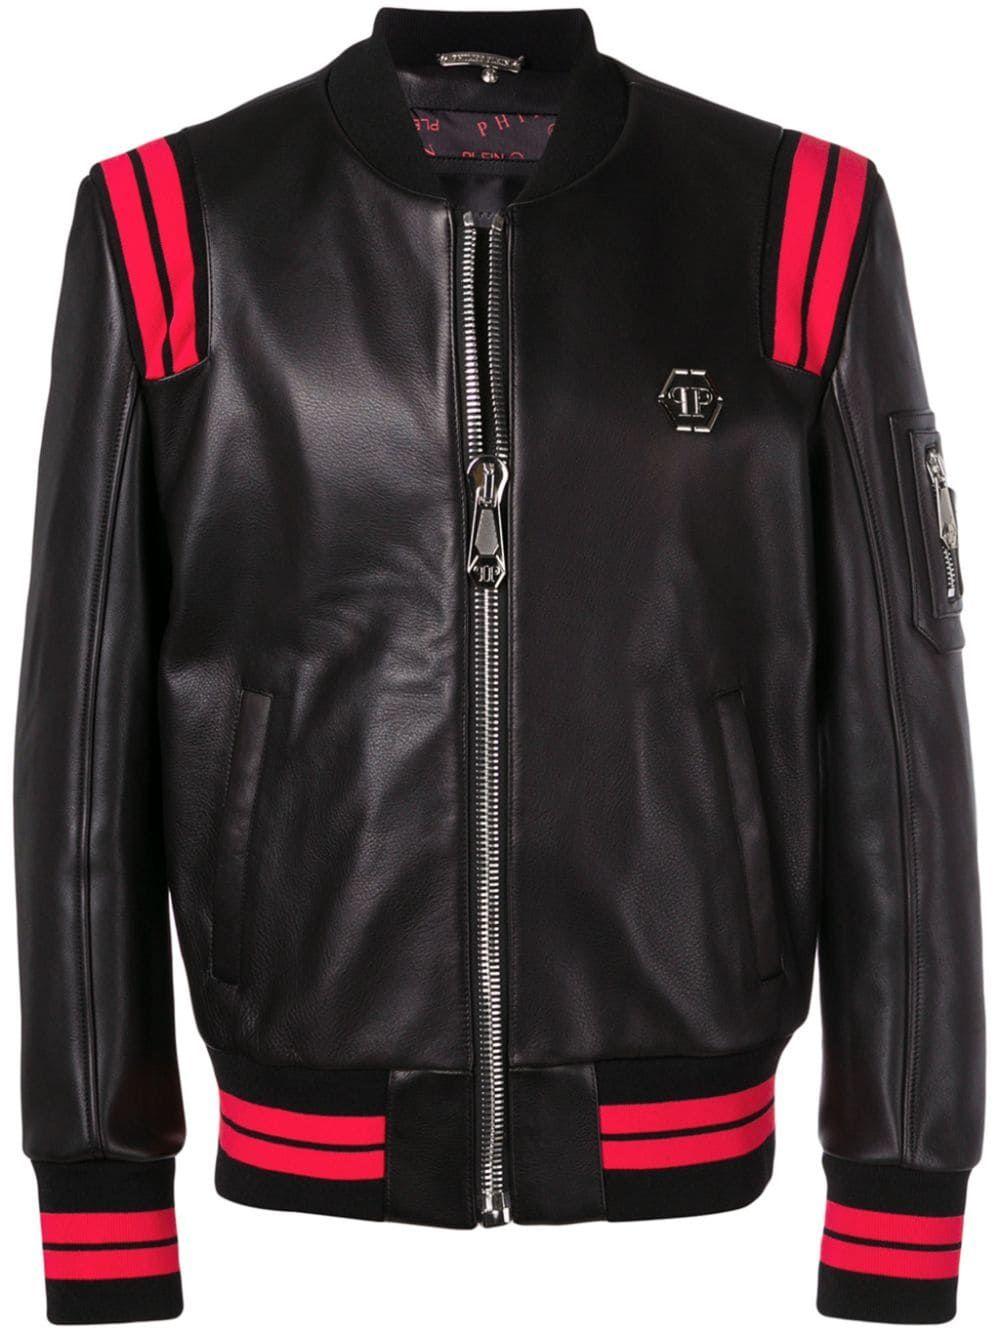 Philipp Plein Statement Jacket Farfetch Statement Jacket Designer Jackets For Men Patterned Bomber Jacket [ 1333 x 1000 Pixel ]